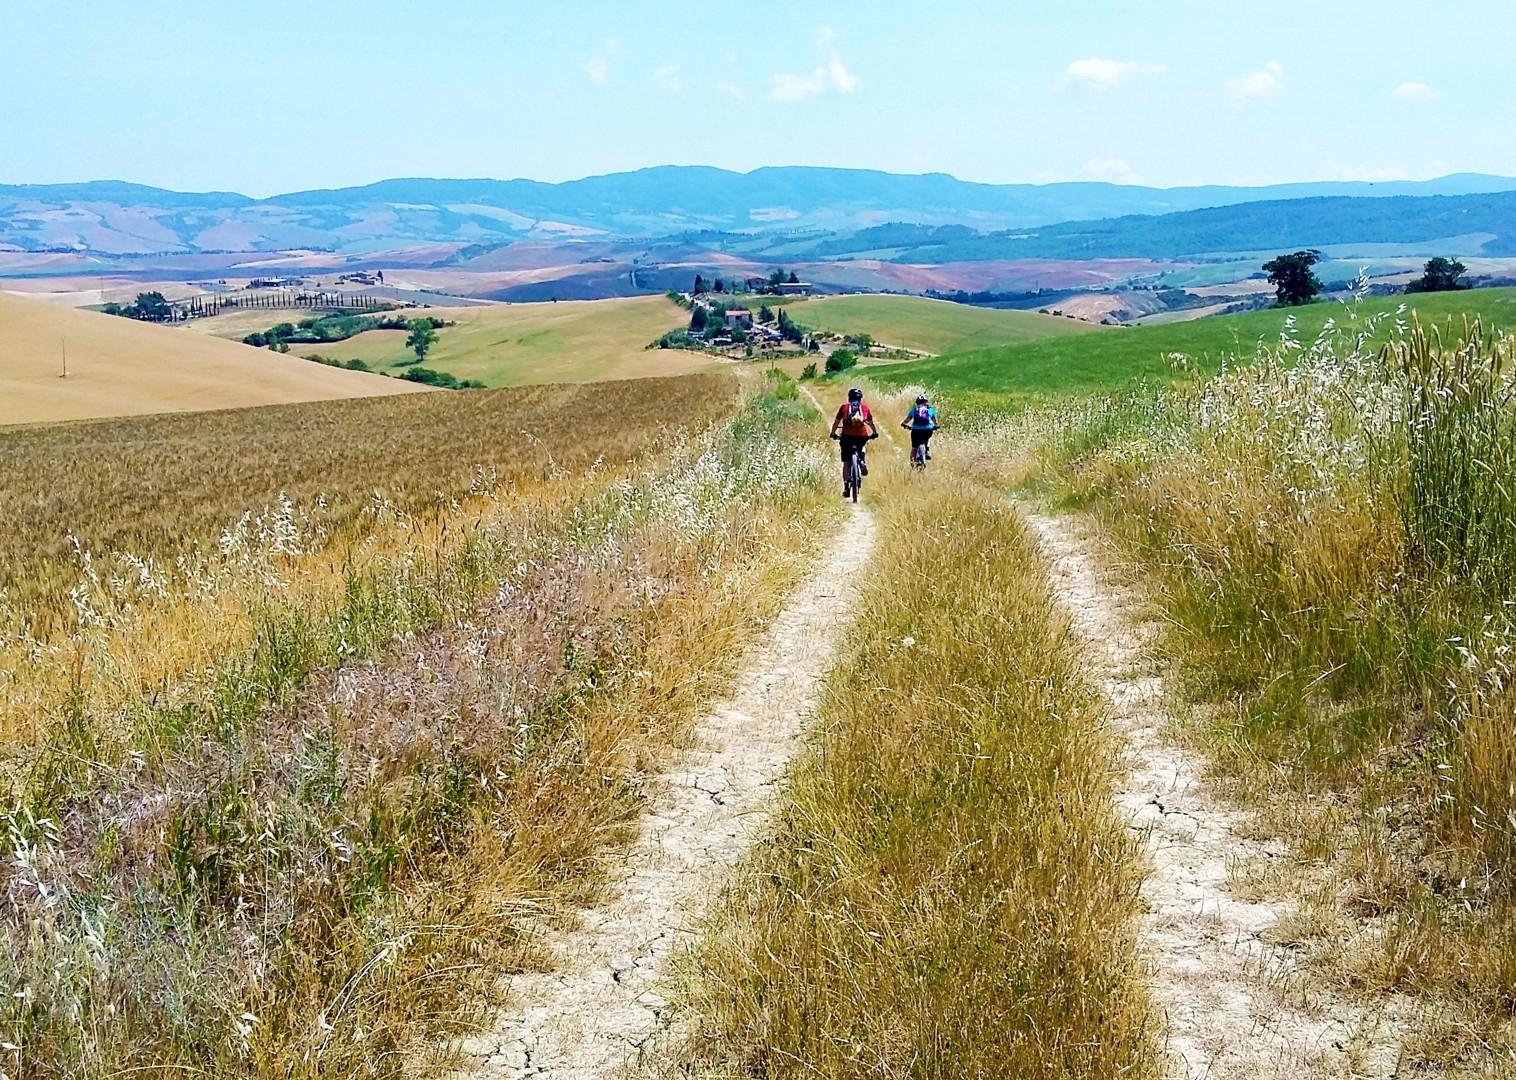 mountain-bike-holiday-saddle-skedaddle-self-guided-italy-trip.jpg - Italy - Via Francigena (Tuscany to Rome) - Self-Guided Mountain Bike Holiday - Mountain Biking